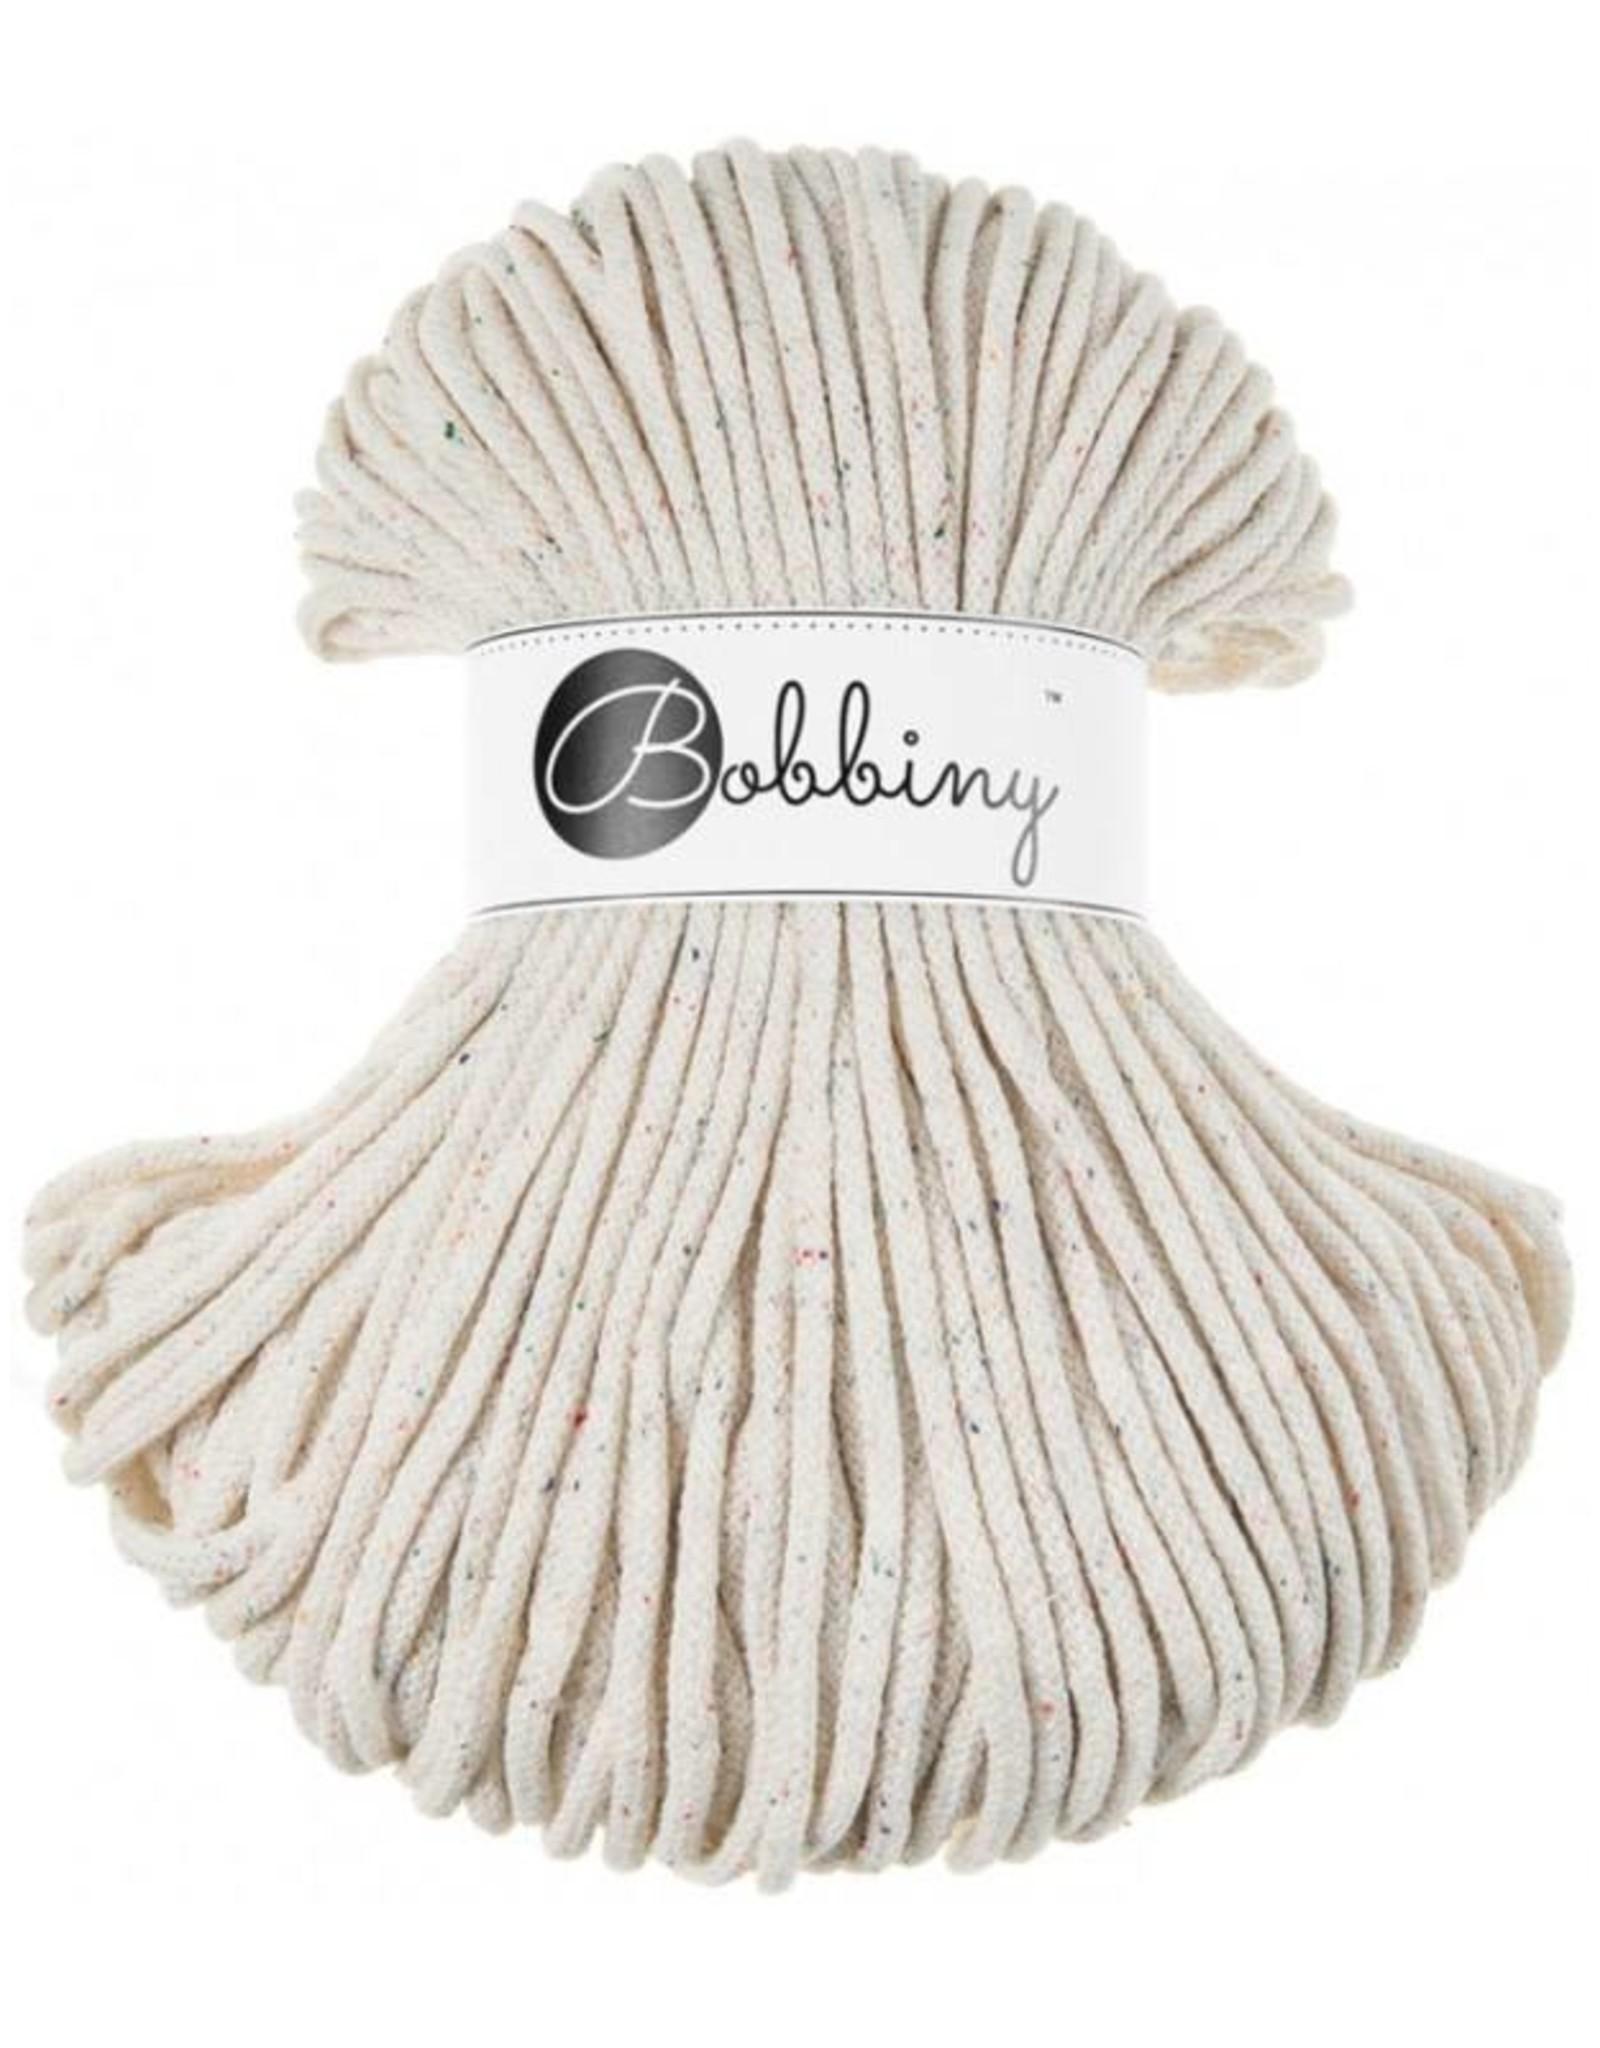 Bobbiny Bobbiny - premium